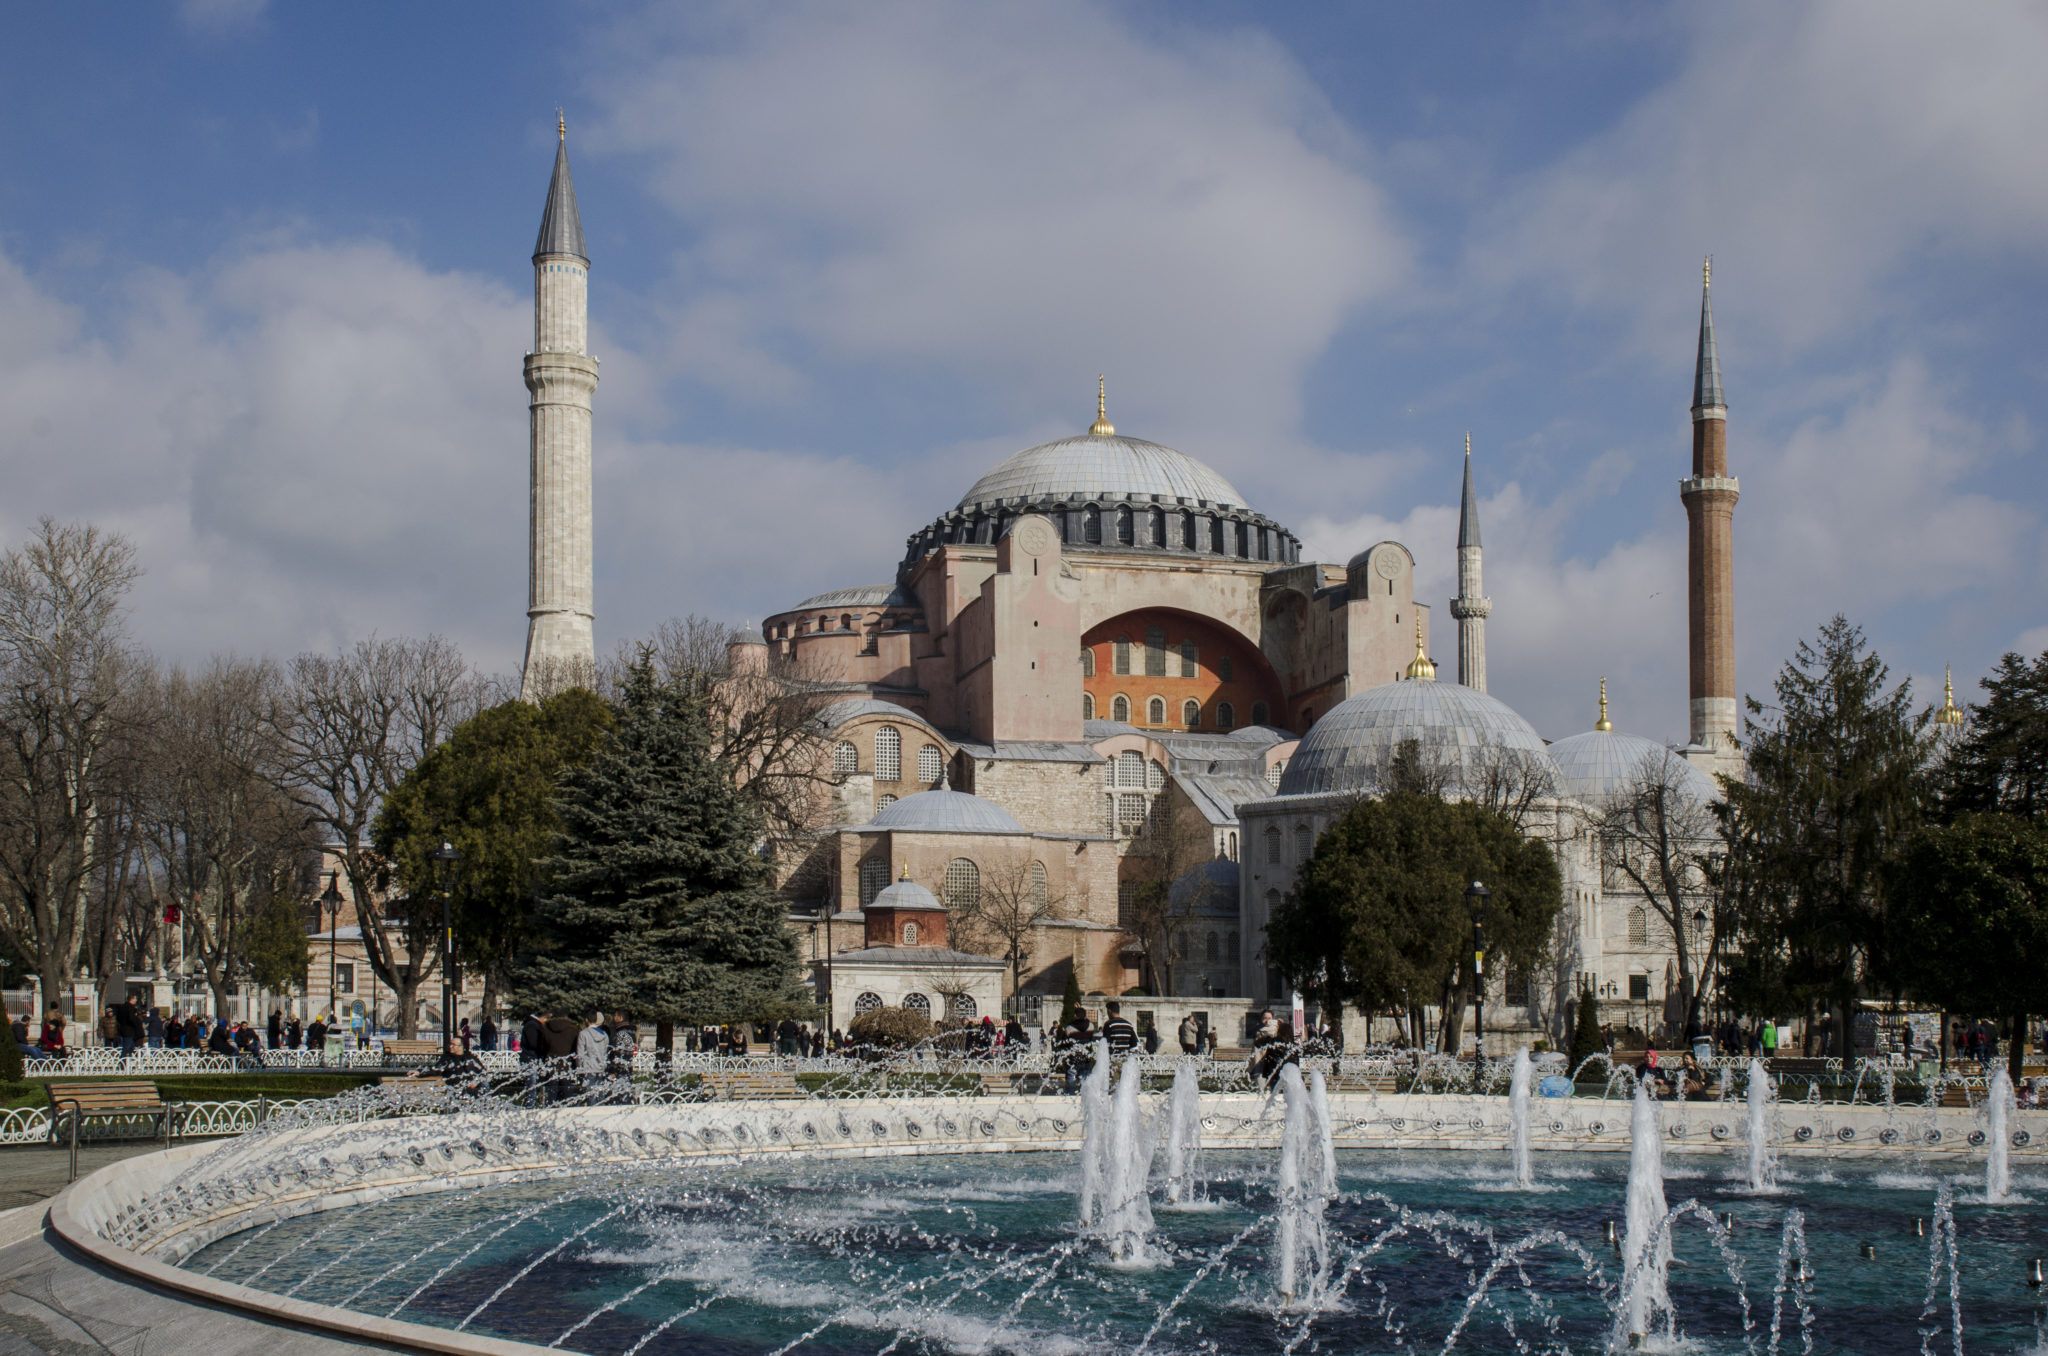 Tuerkei-Sehenswuerdigkeiten-Hagia-Sophia-Moschee